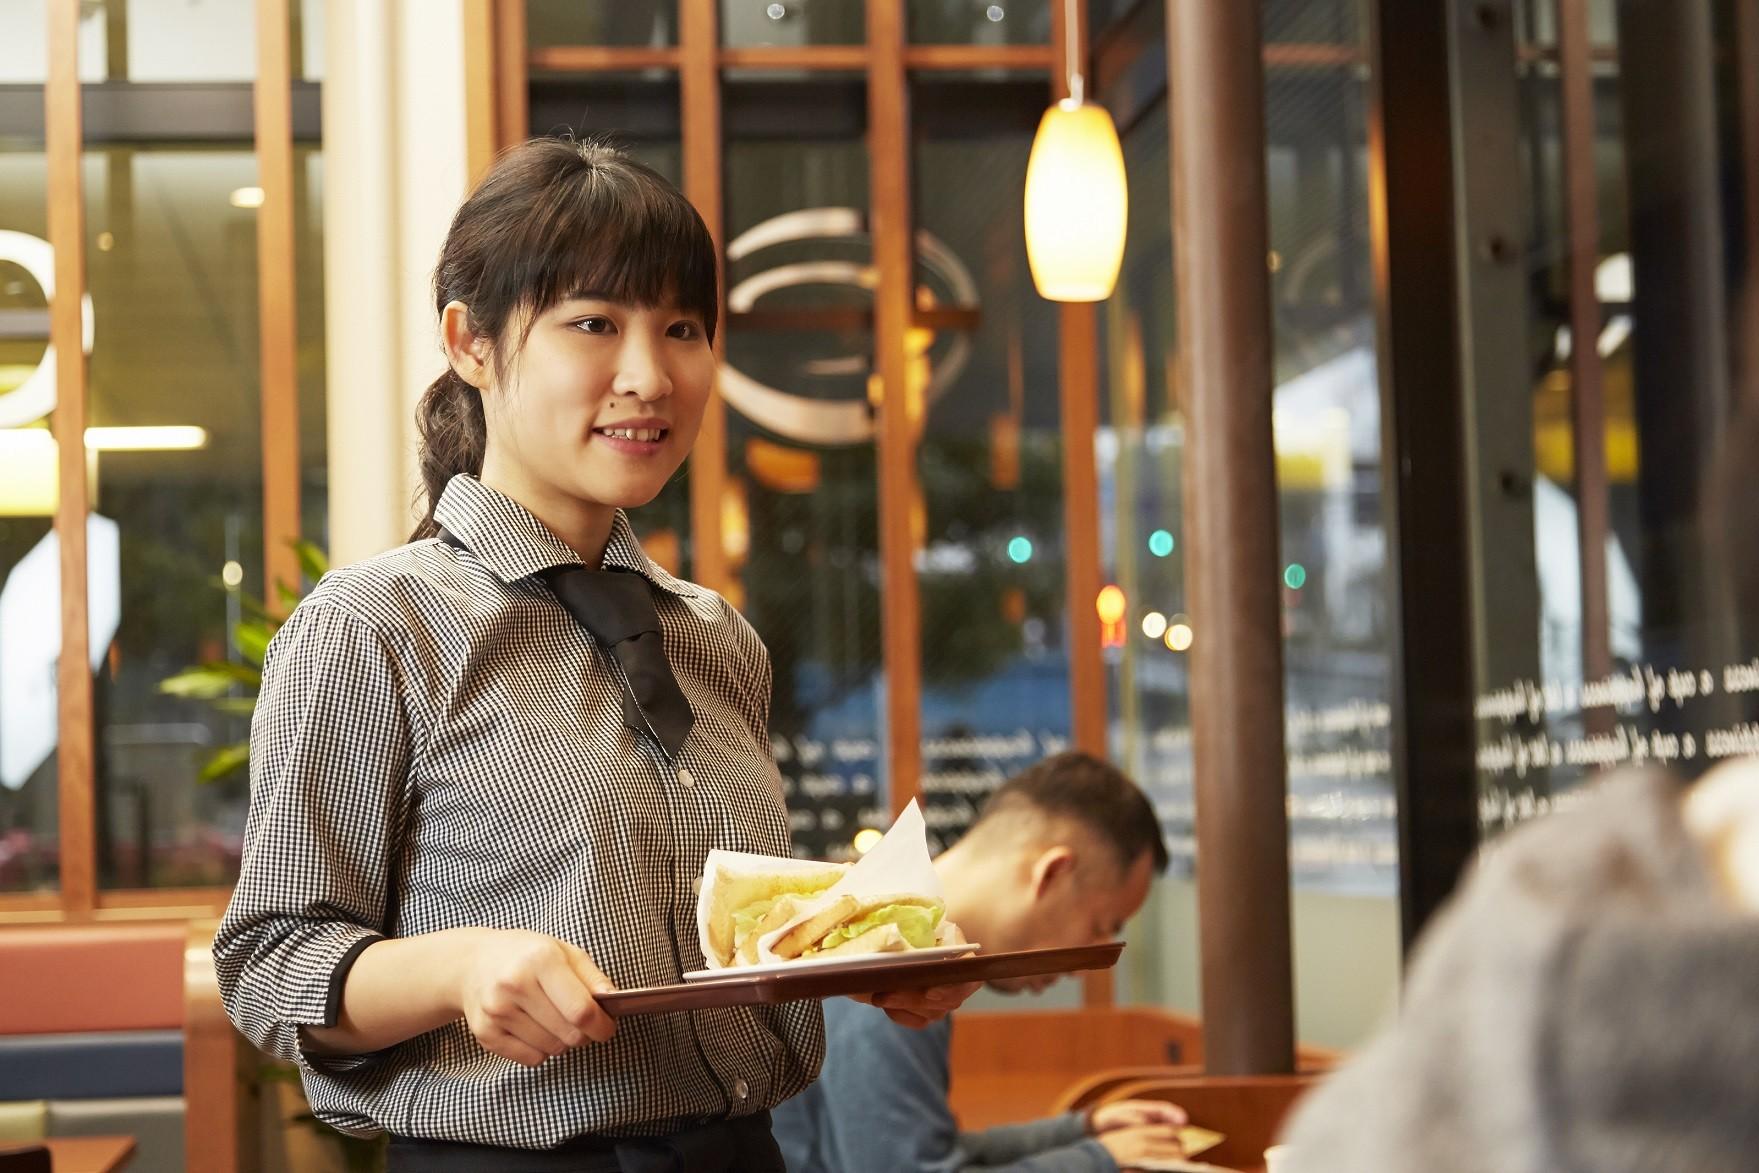 CAFE de CRIE PLUS(カフェ・ド・クリエプラス) 汐留芝離宮 のアルバイト情報